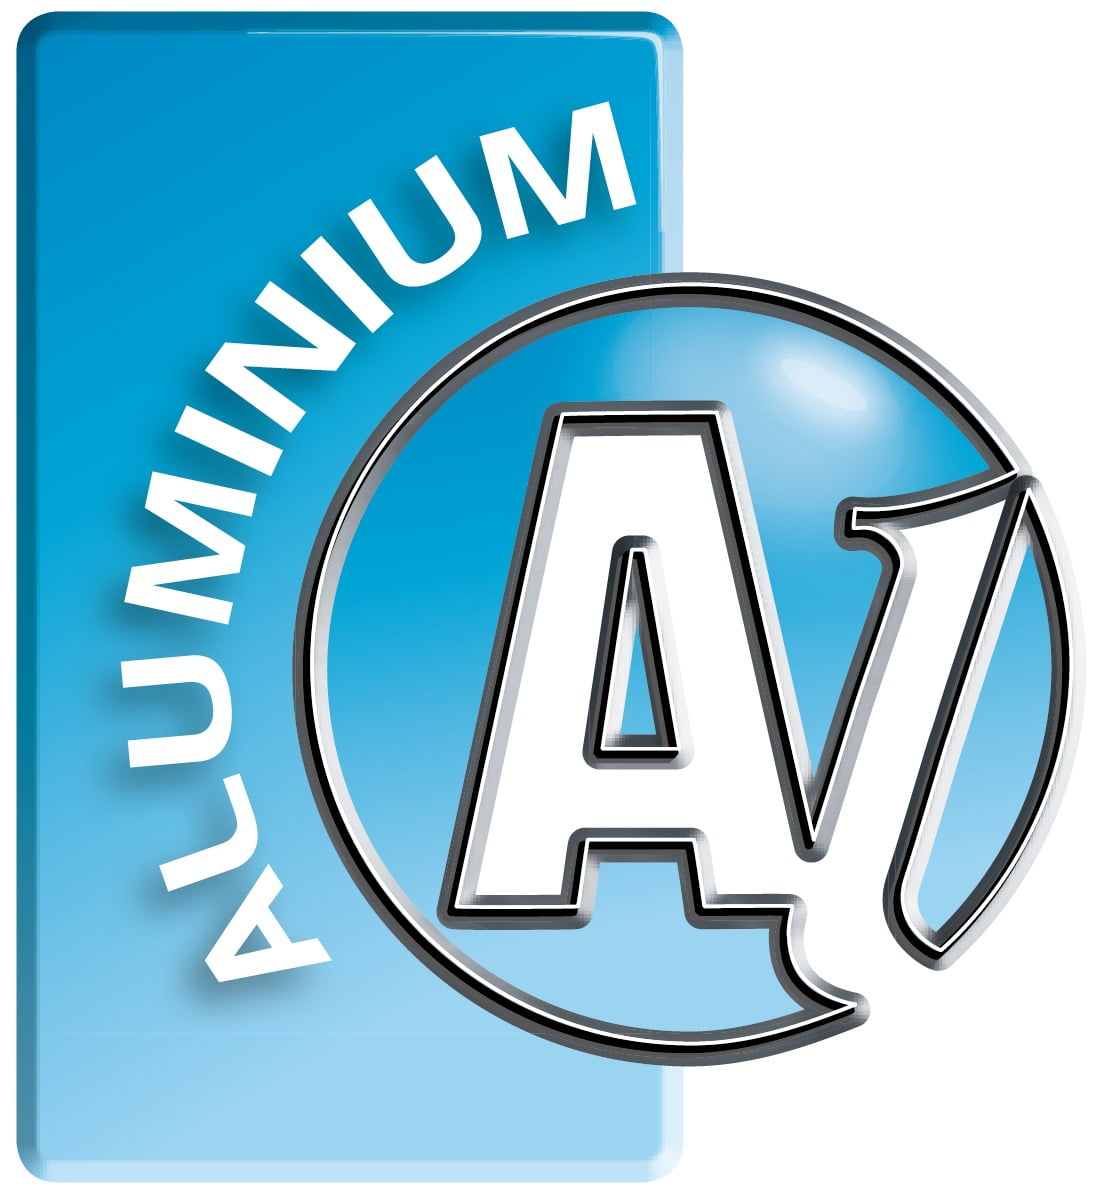 Product, Rectangle, Font, Aqua